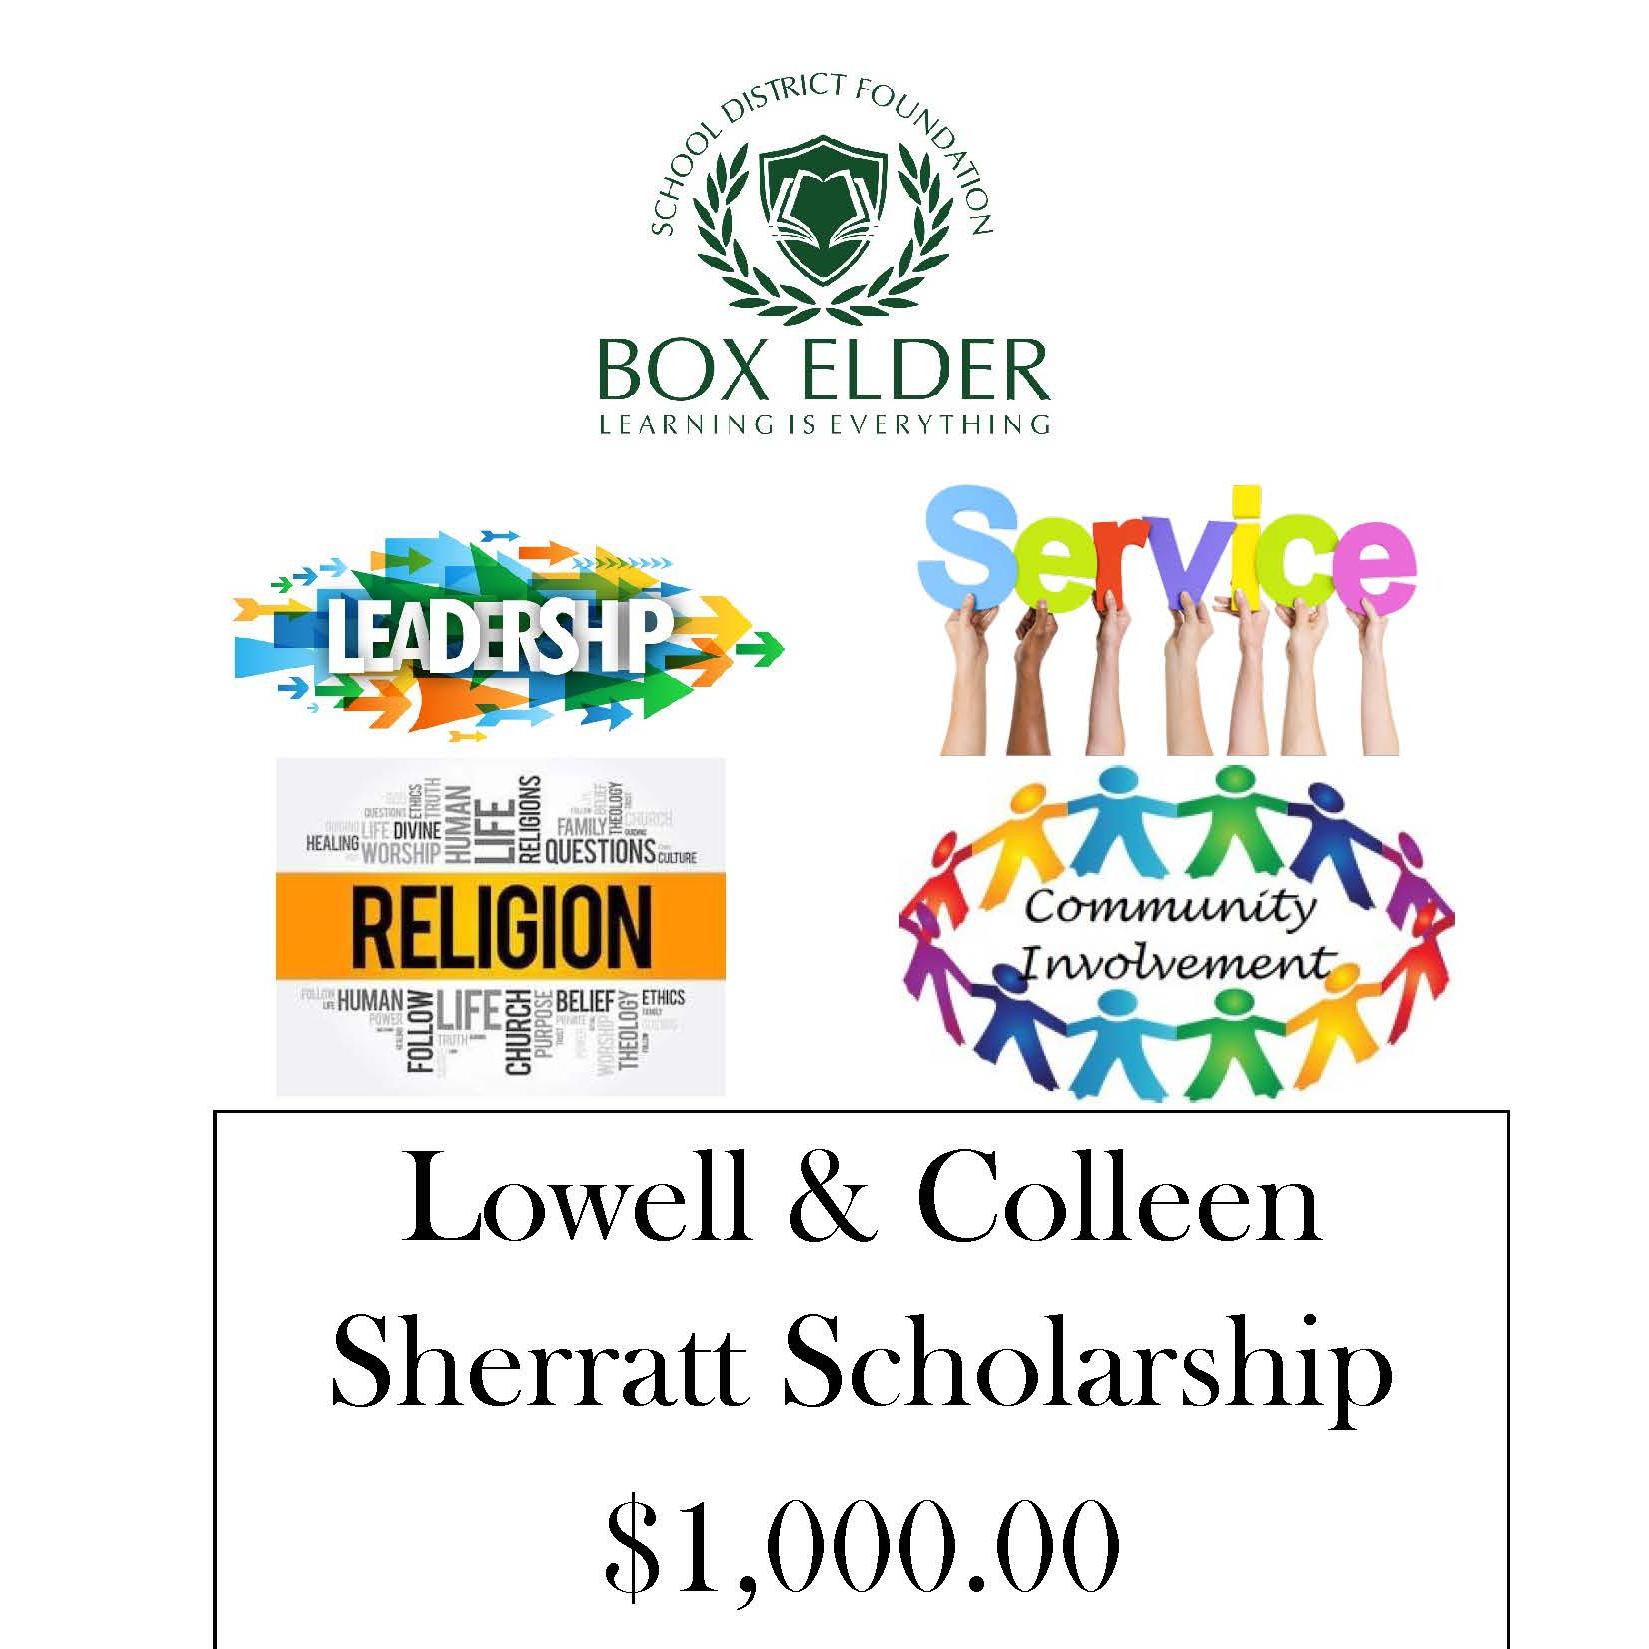 Lowell & Colleen Sherratt Scholarship